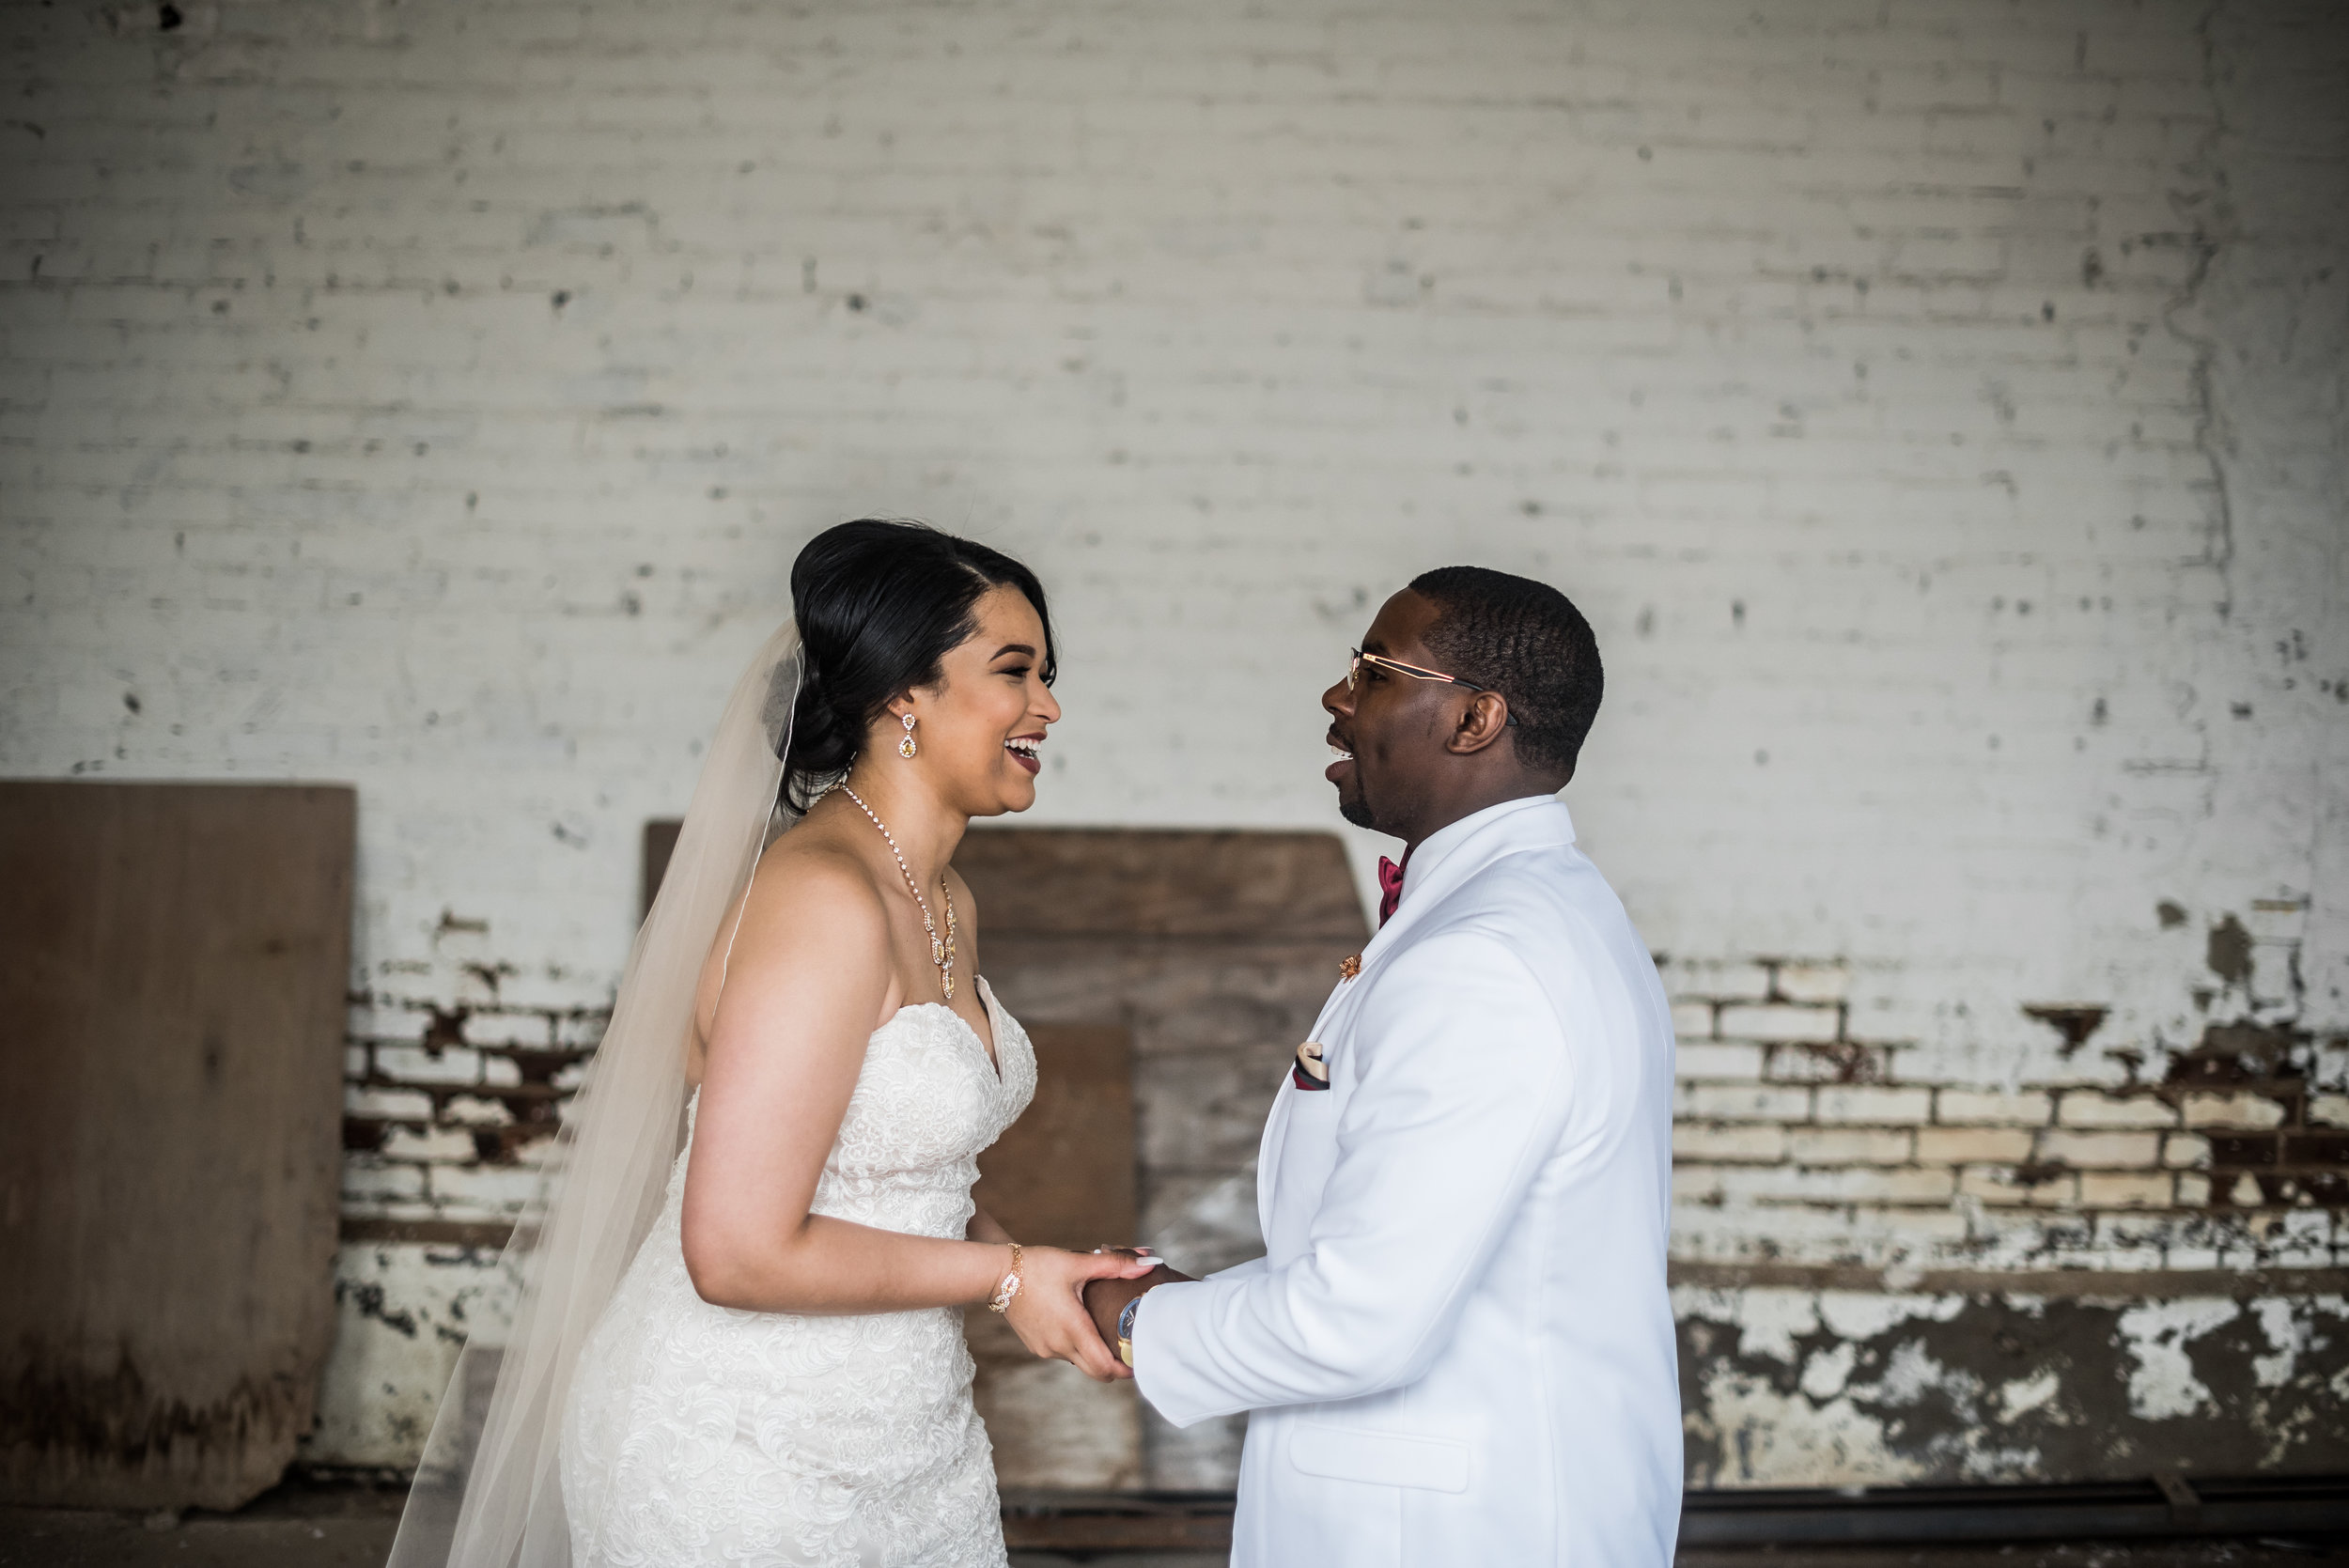 Burlington Iowa Wedding Midwest Photographer Melissa Cervantes _ Chantelle and Isaiah 104cc.jpg